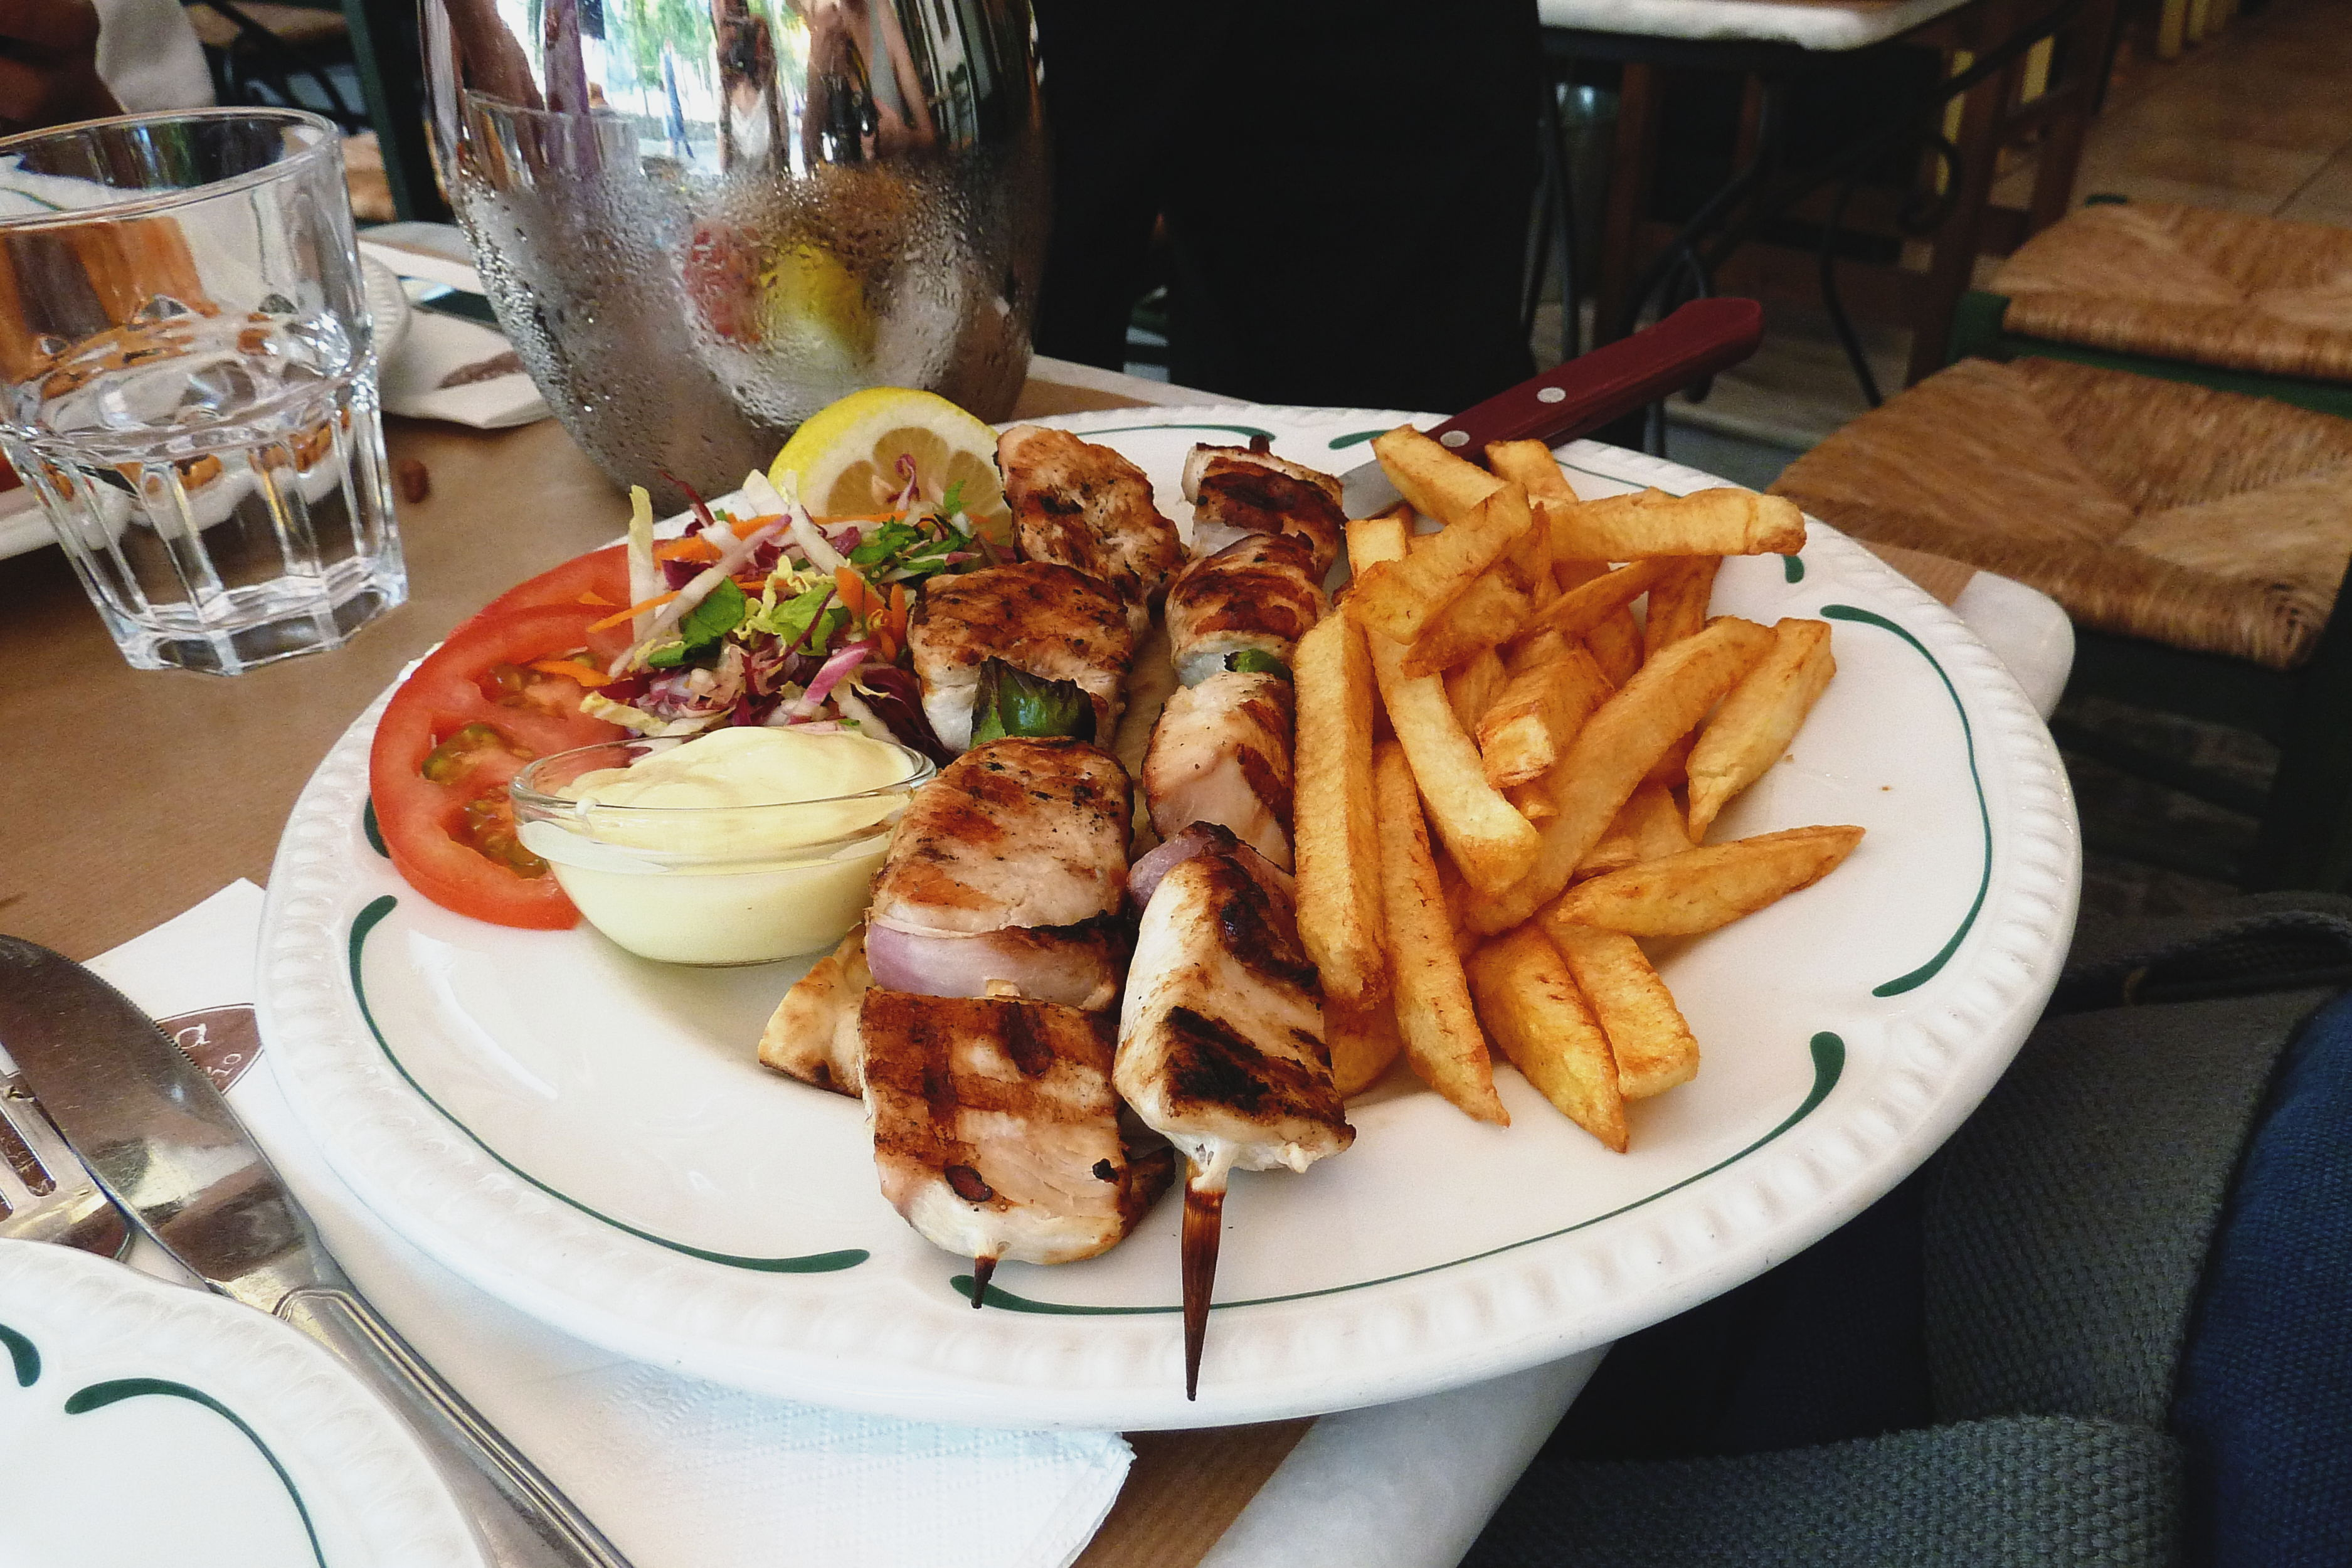 Sister's Chicken Souvlaki Plate, Dia Tauta, Athens